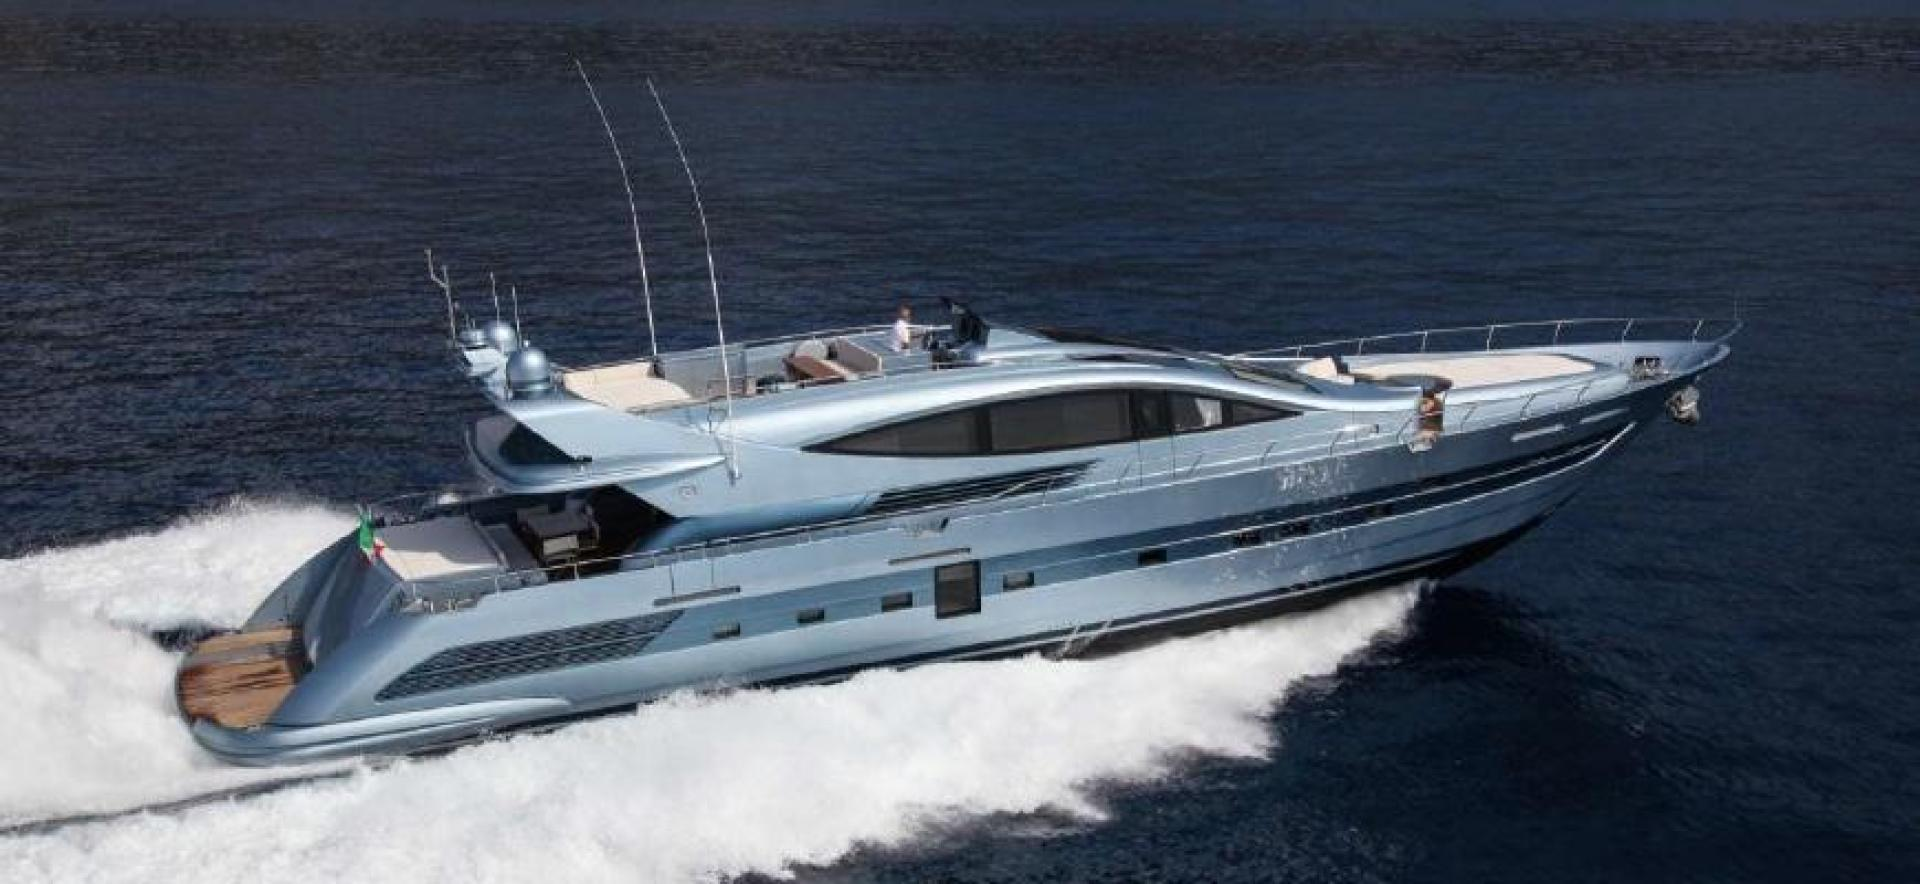 2017 Cerri Cantieri Navali 102' FLYINGSPORT